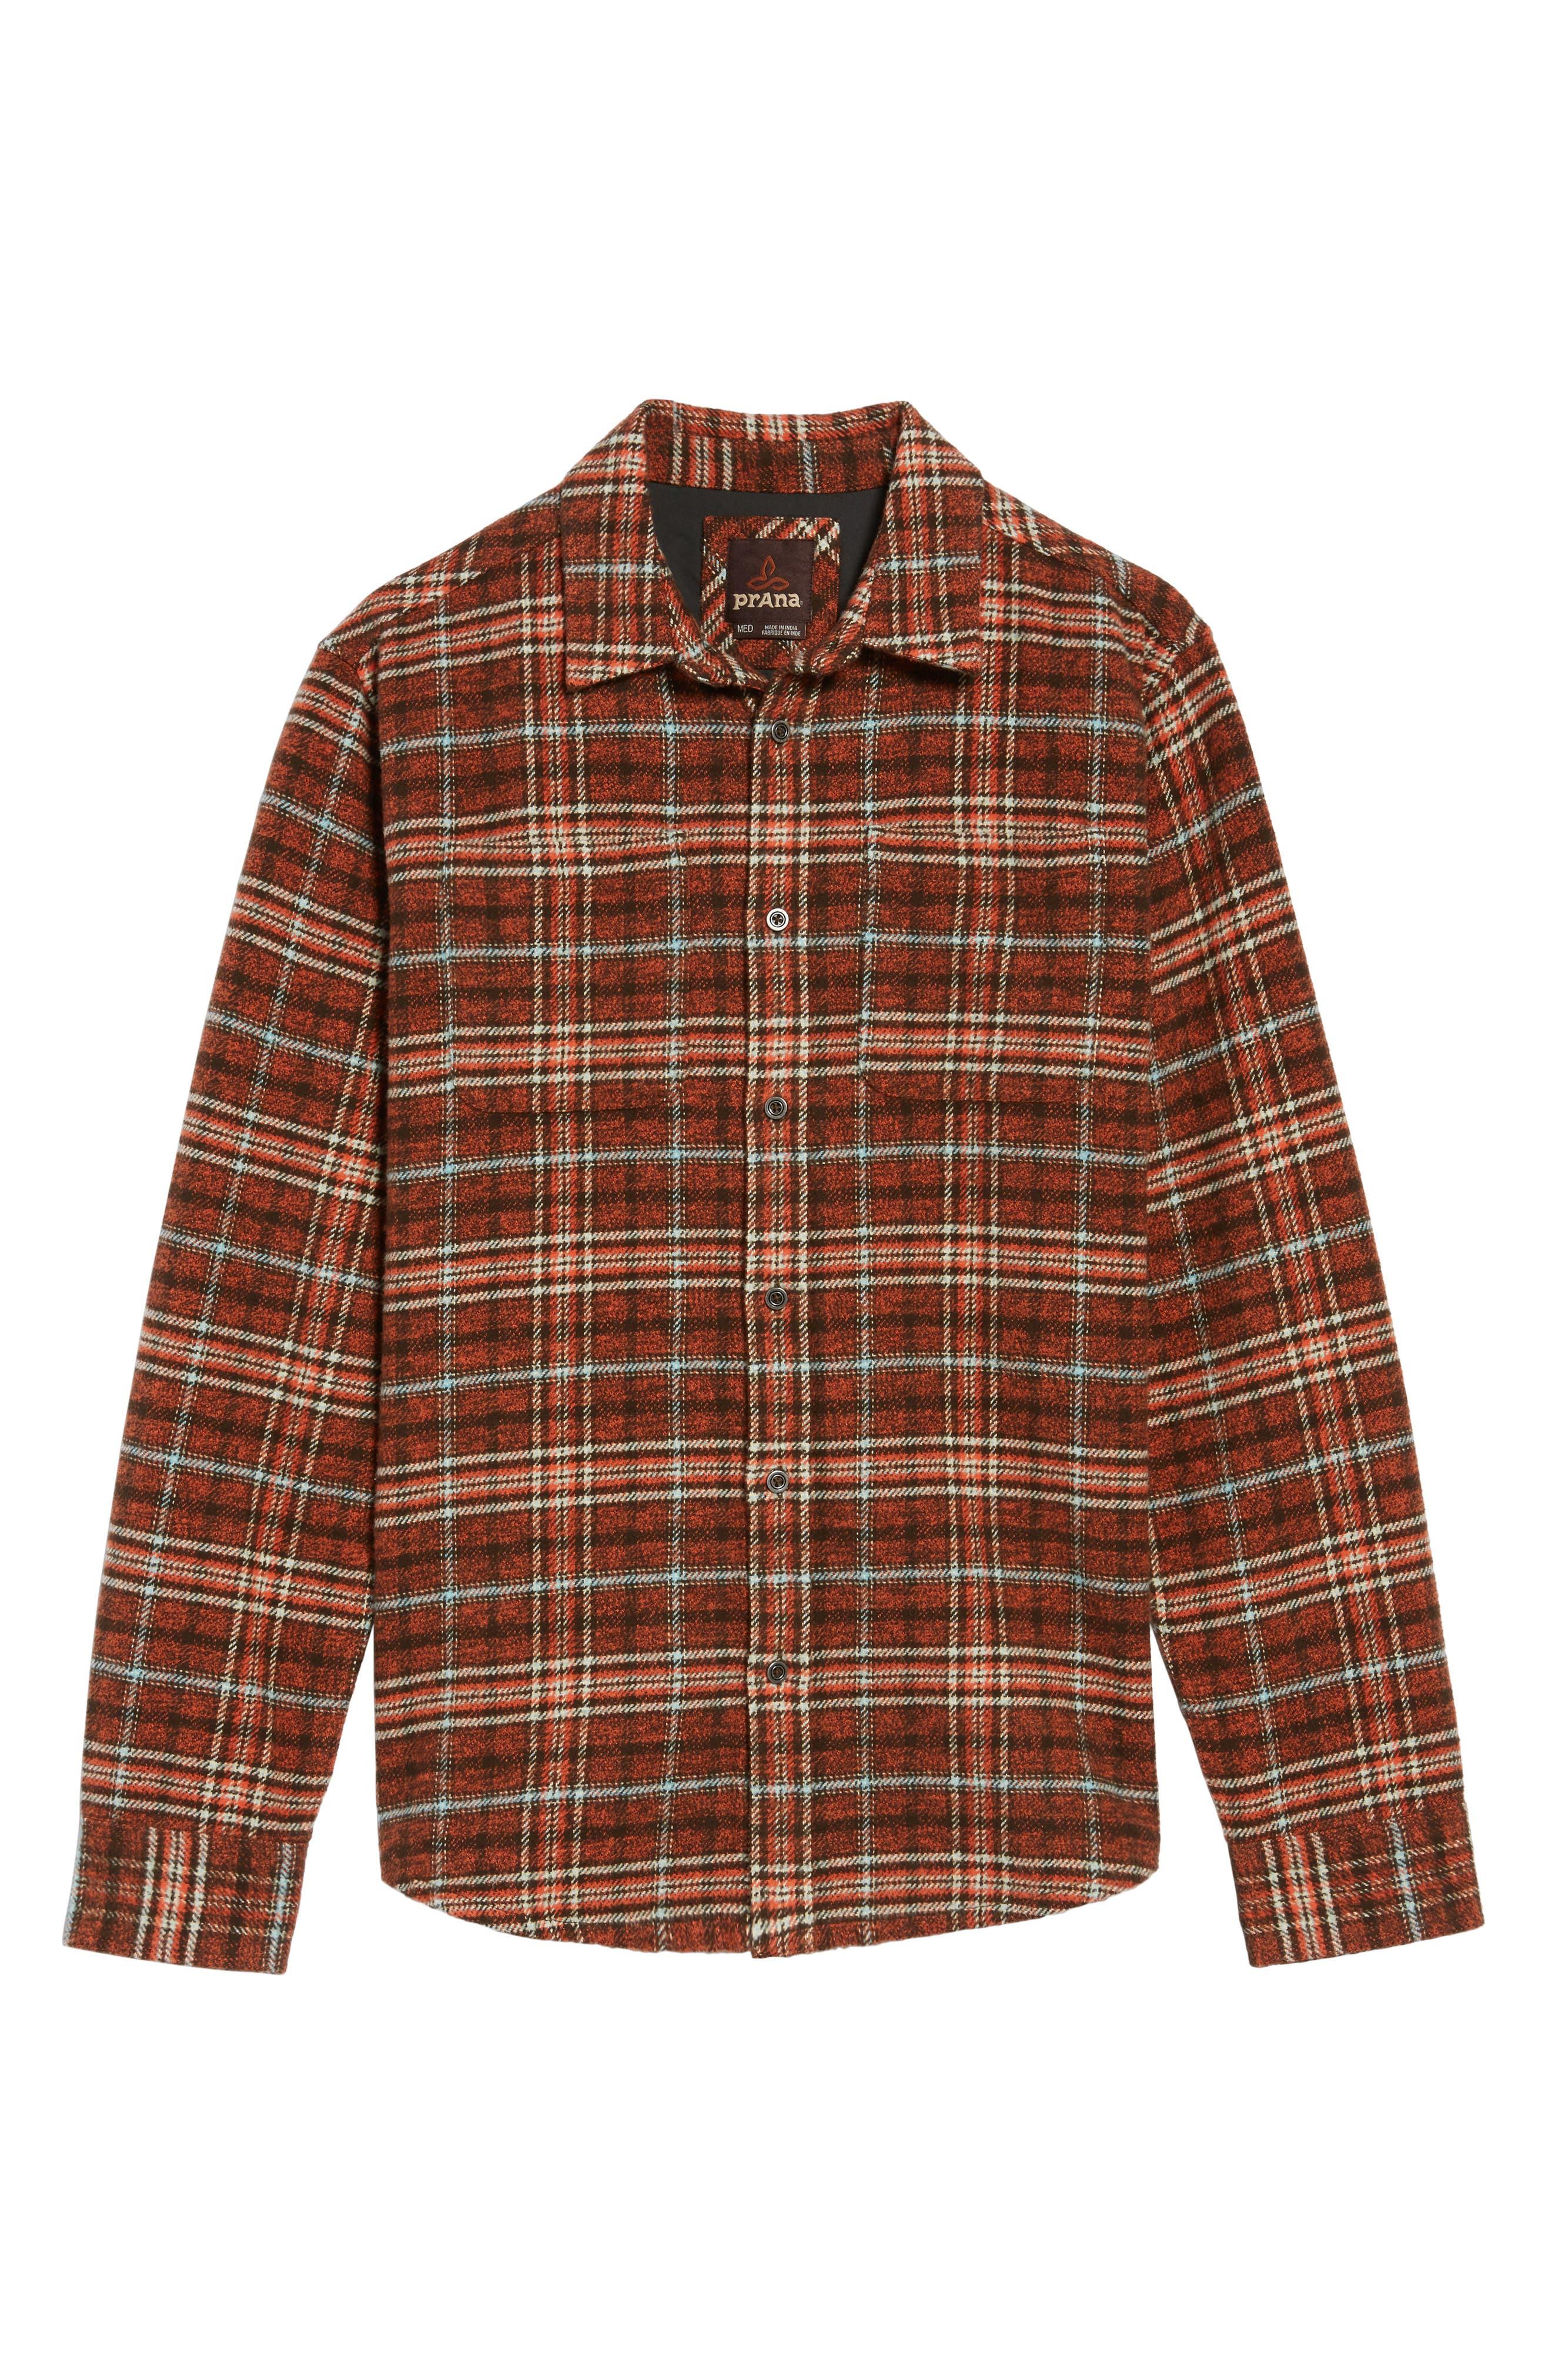 Brayden Regular Fit Plaid Flannel Shirt,                             Alternate thumbnail 12, color,